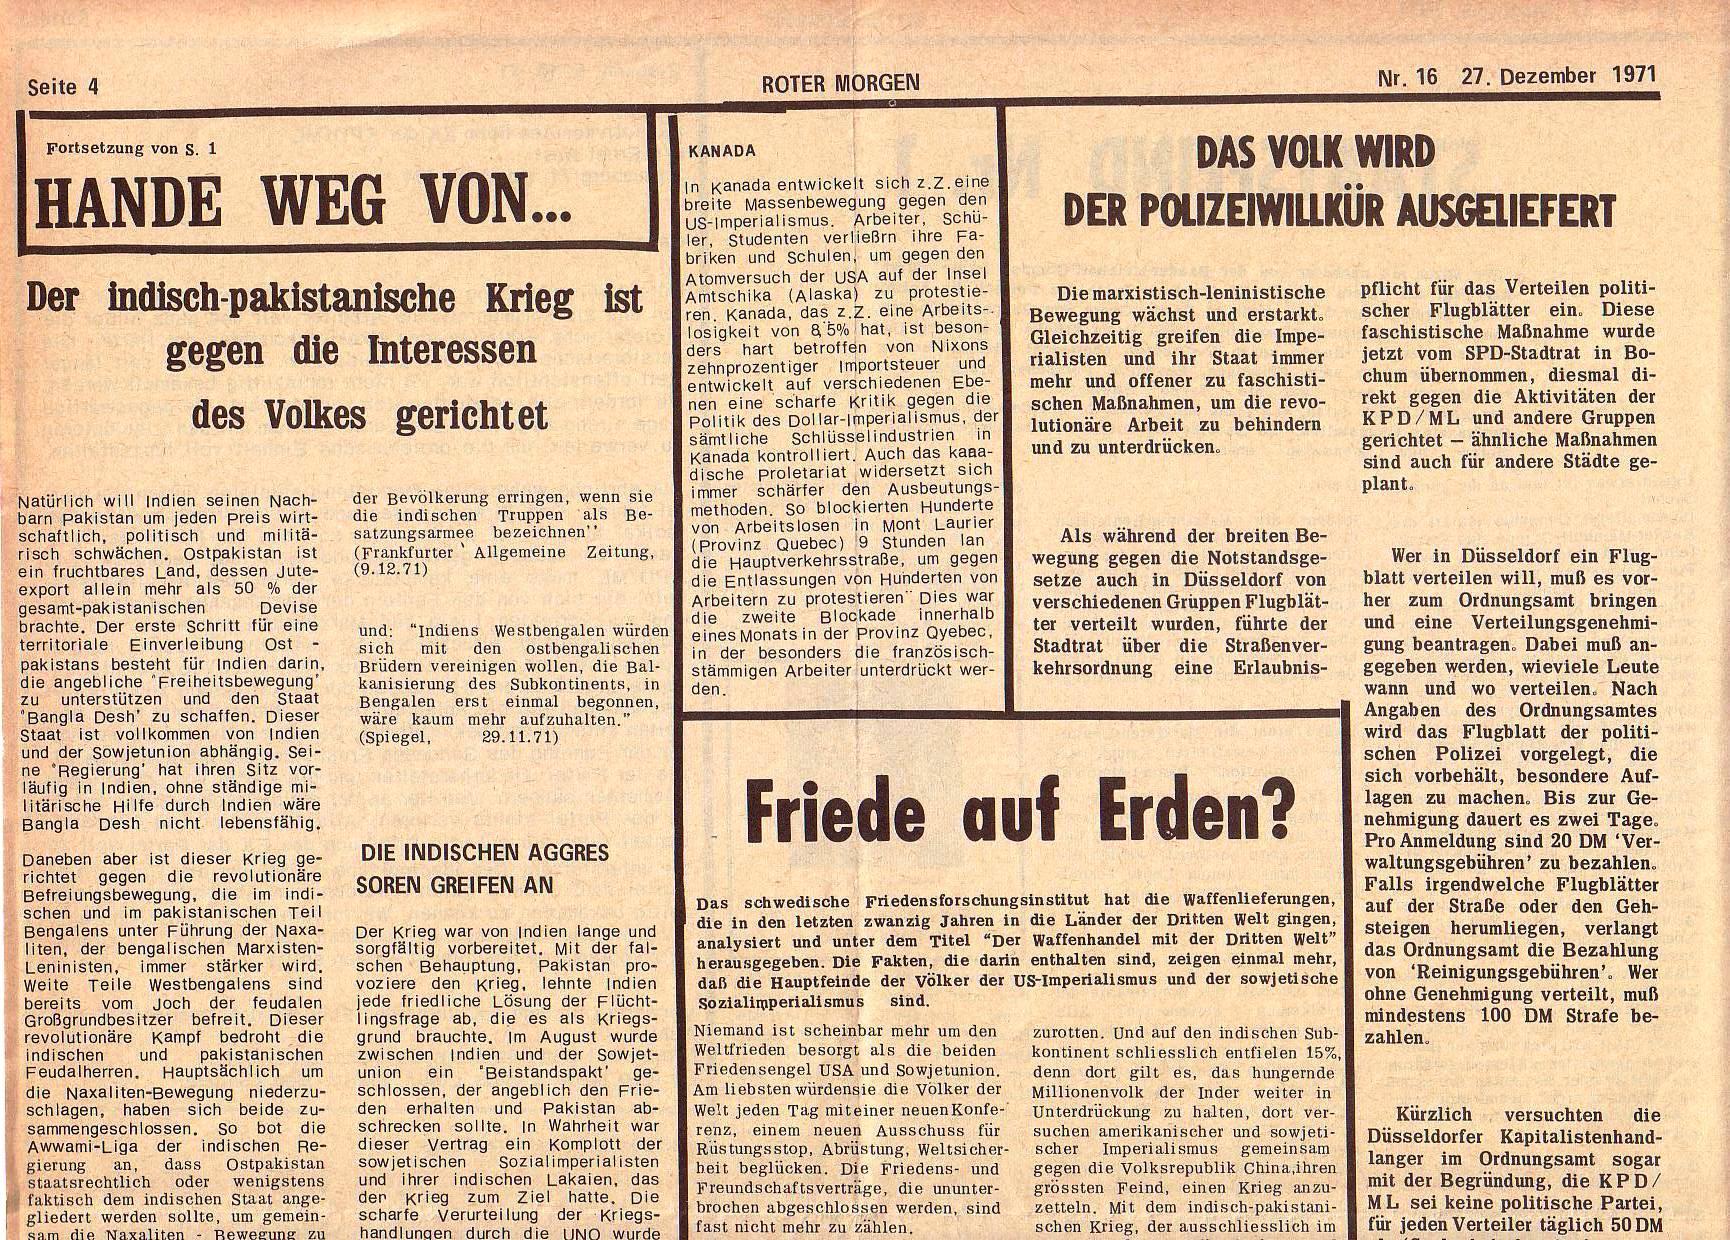 Roter Morgen, 5. Jg., 27. Dezember 1971, Nr. 16, Seite 4a